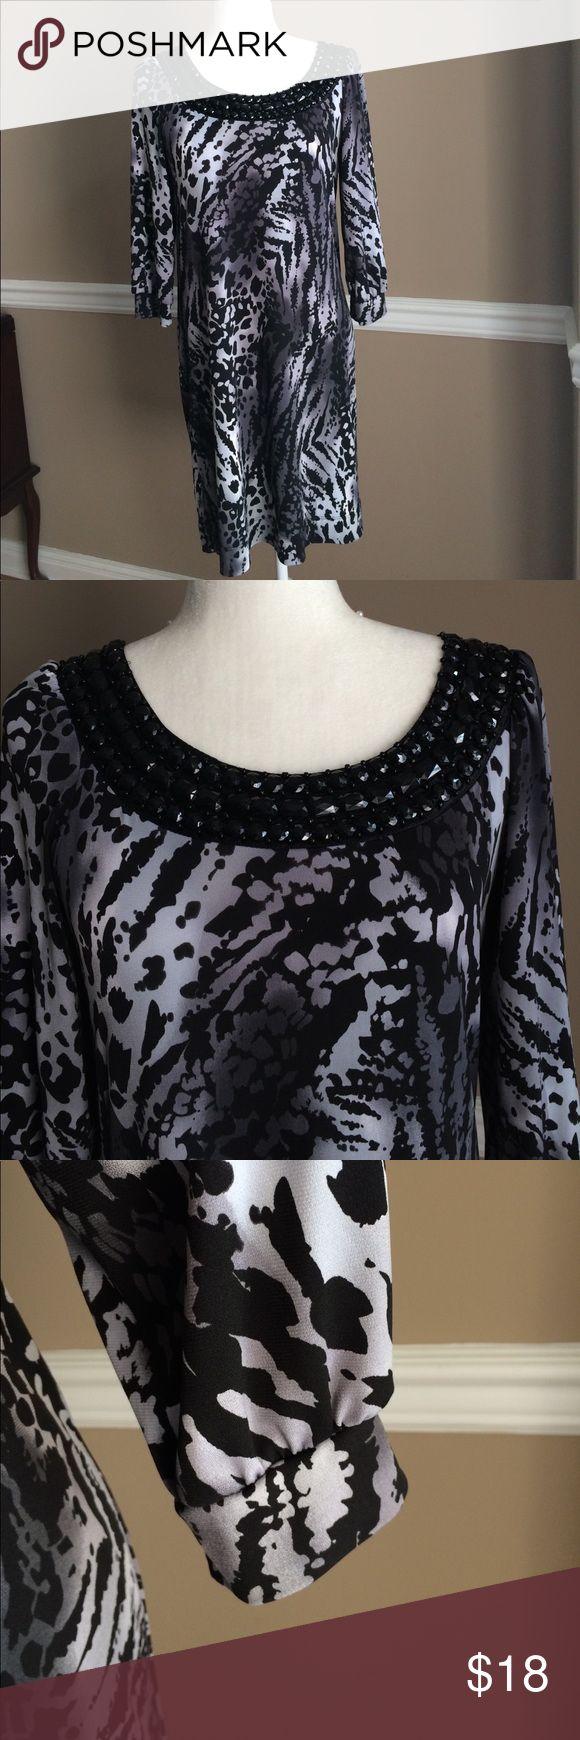 Animal print dress Slimming dress, jeweled neckline, very good condition B. Smart Dresses